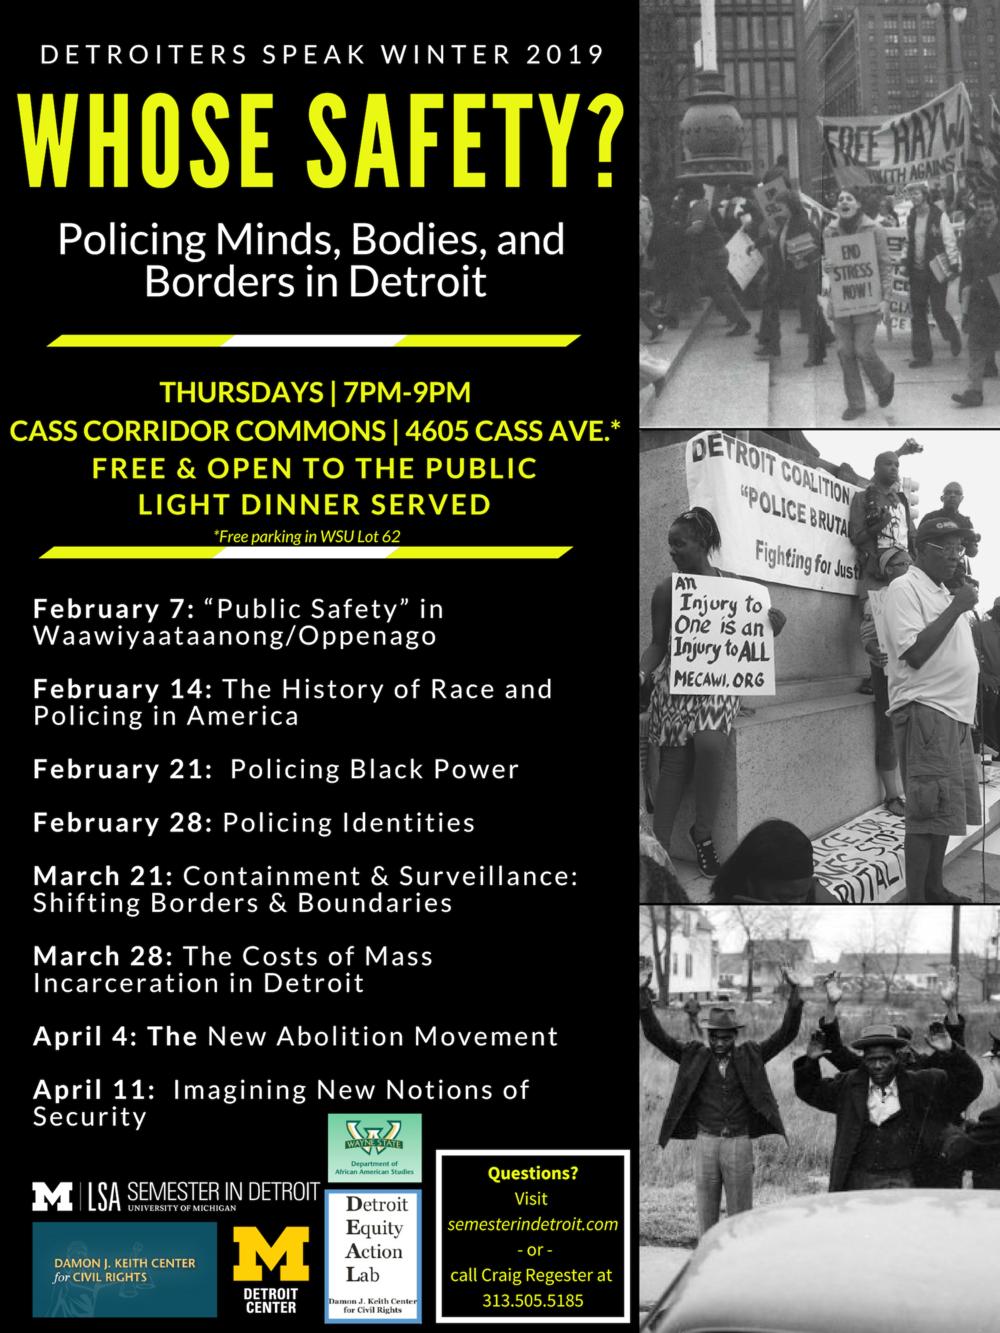 Detroiters Speak Winter 2019 Poster (2).png